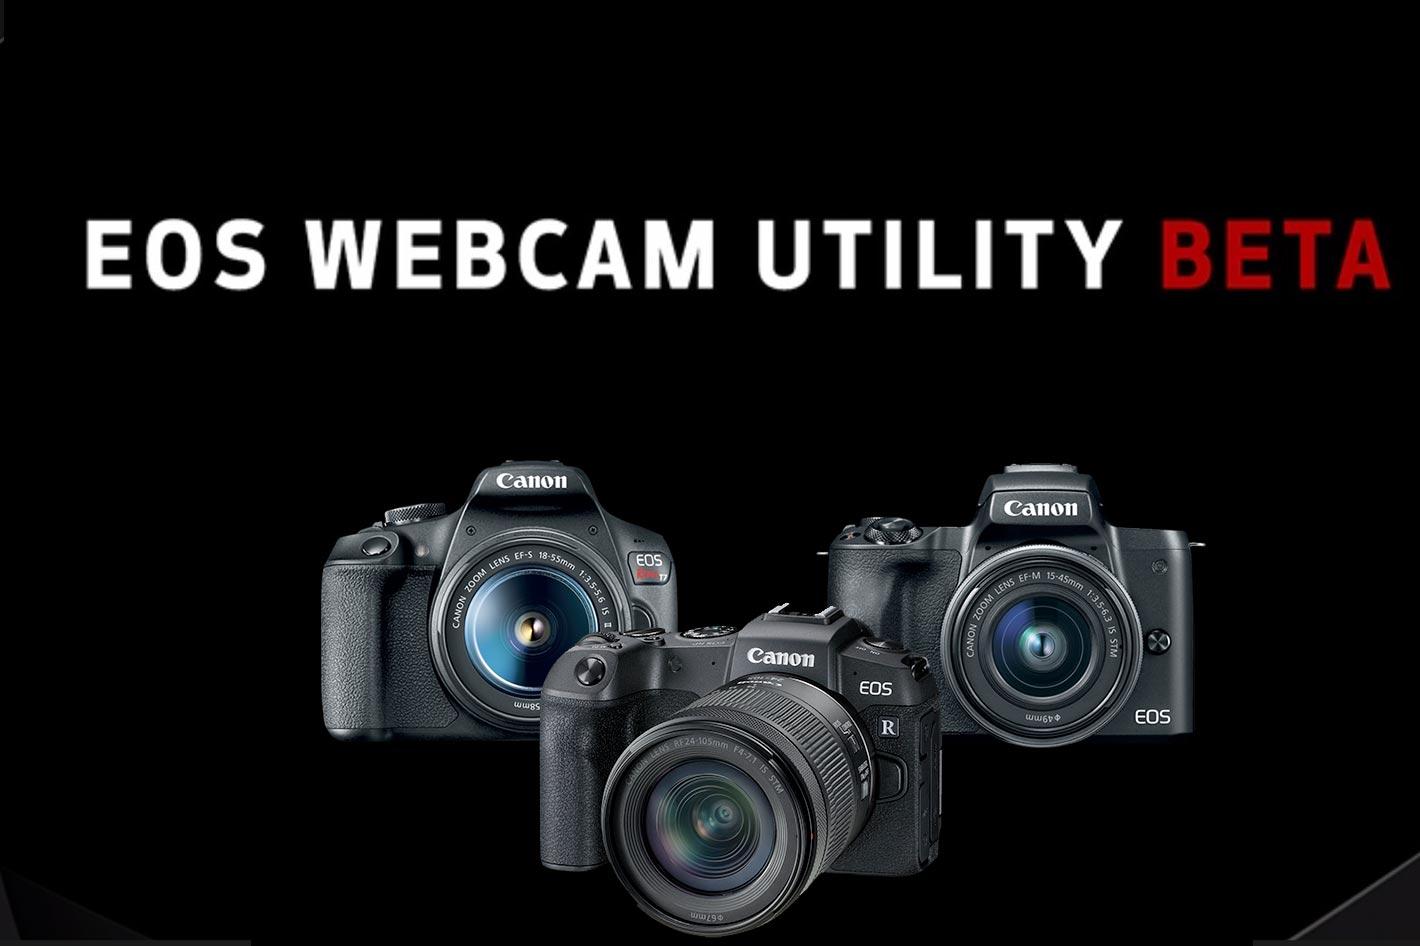 The EOS Webcam Utility Beta software for Mac has arrived!